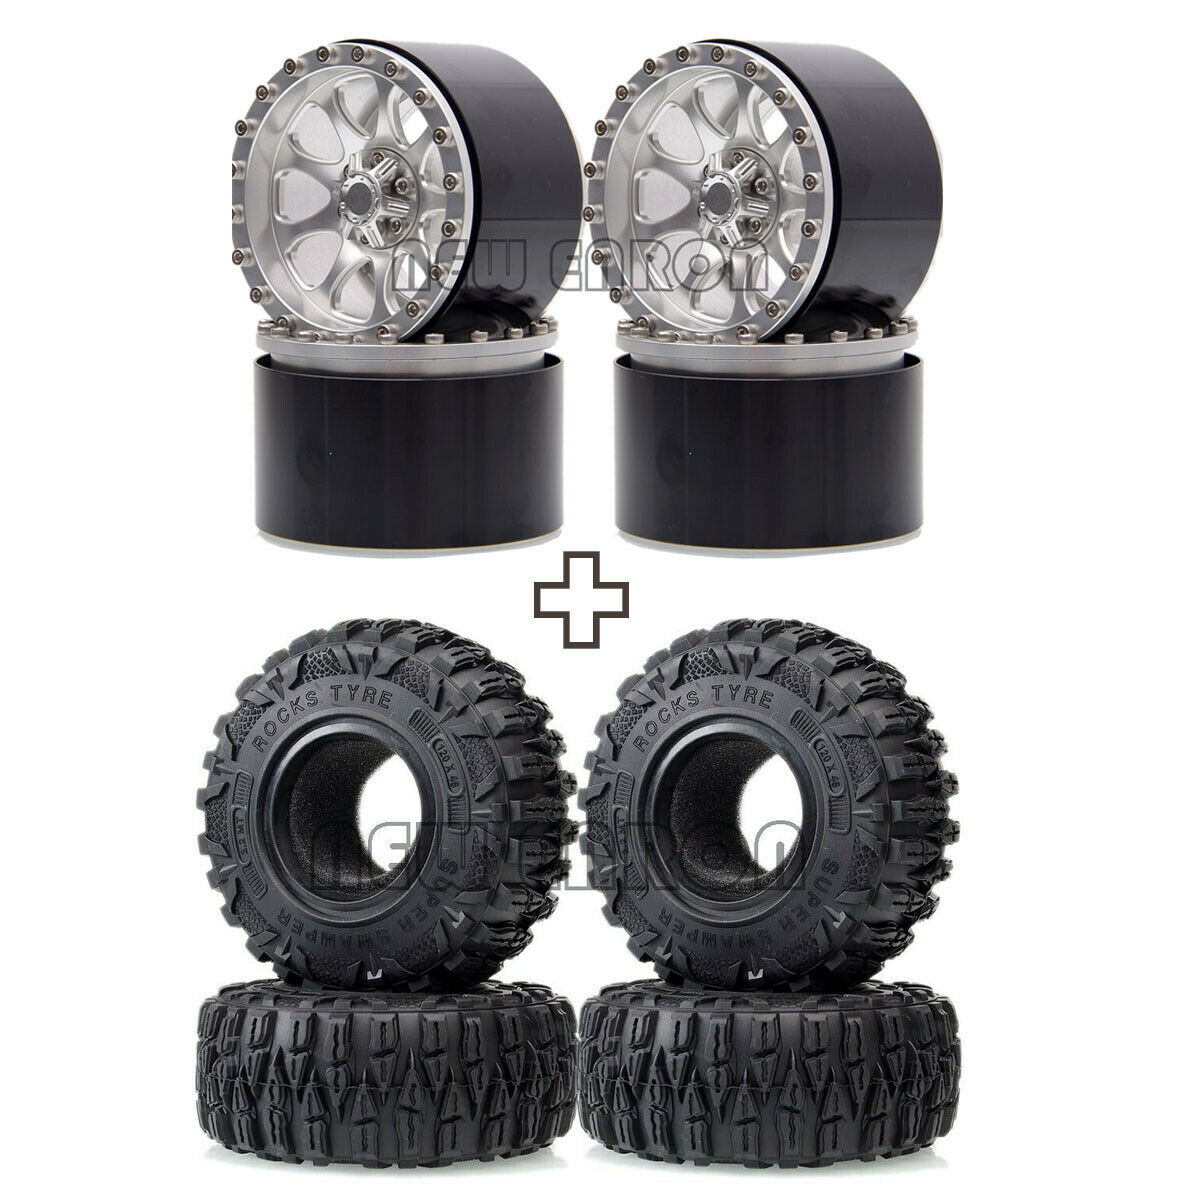 NEW ENRON 4P Auminum 2.2 Inch Beadlock Wheels Rim Hub 120mm Super Swamper Rocks Tires Tyre For 1/10 RC CAR  RR10 Wraith 90018